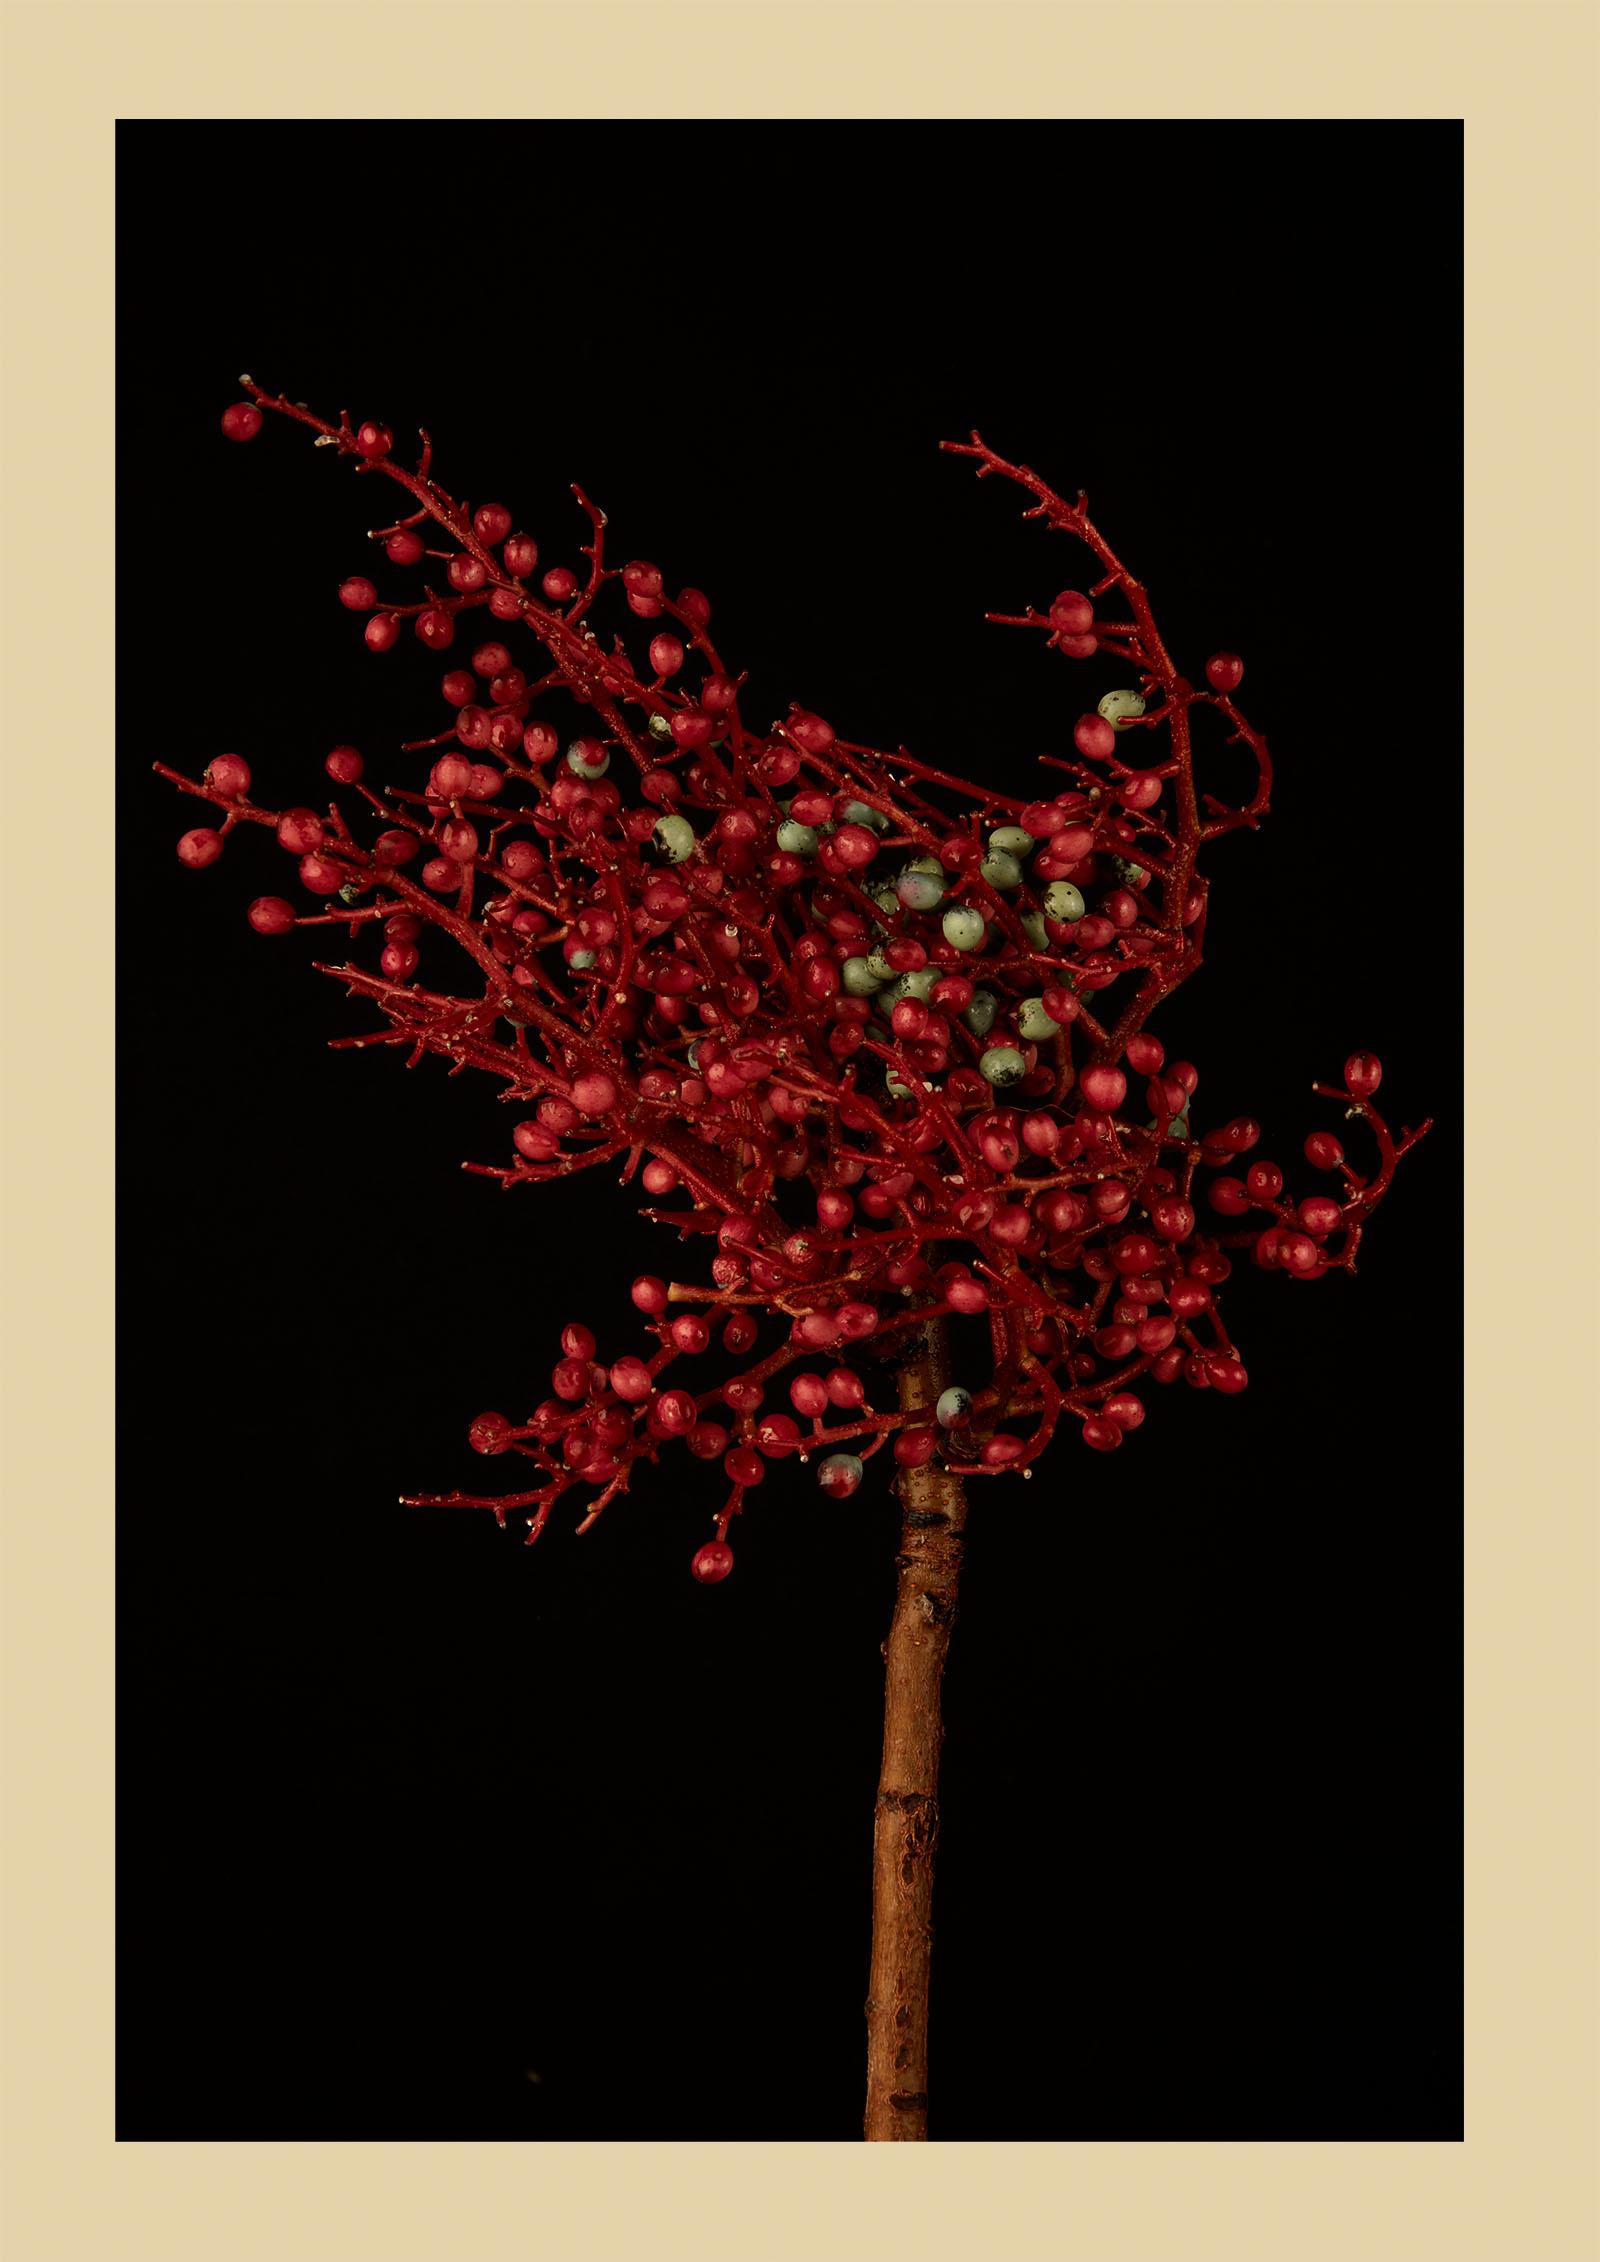 TEST - hanging plants0589-2.jpg